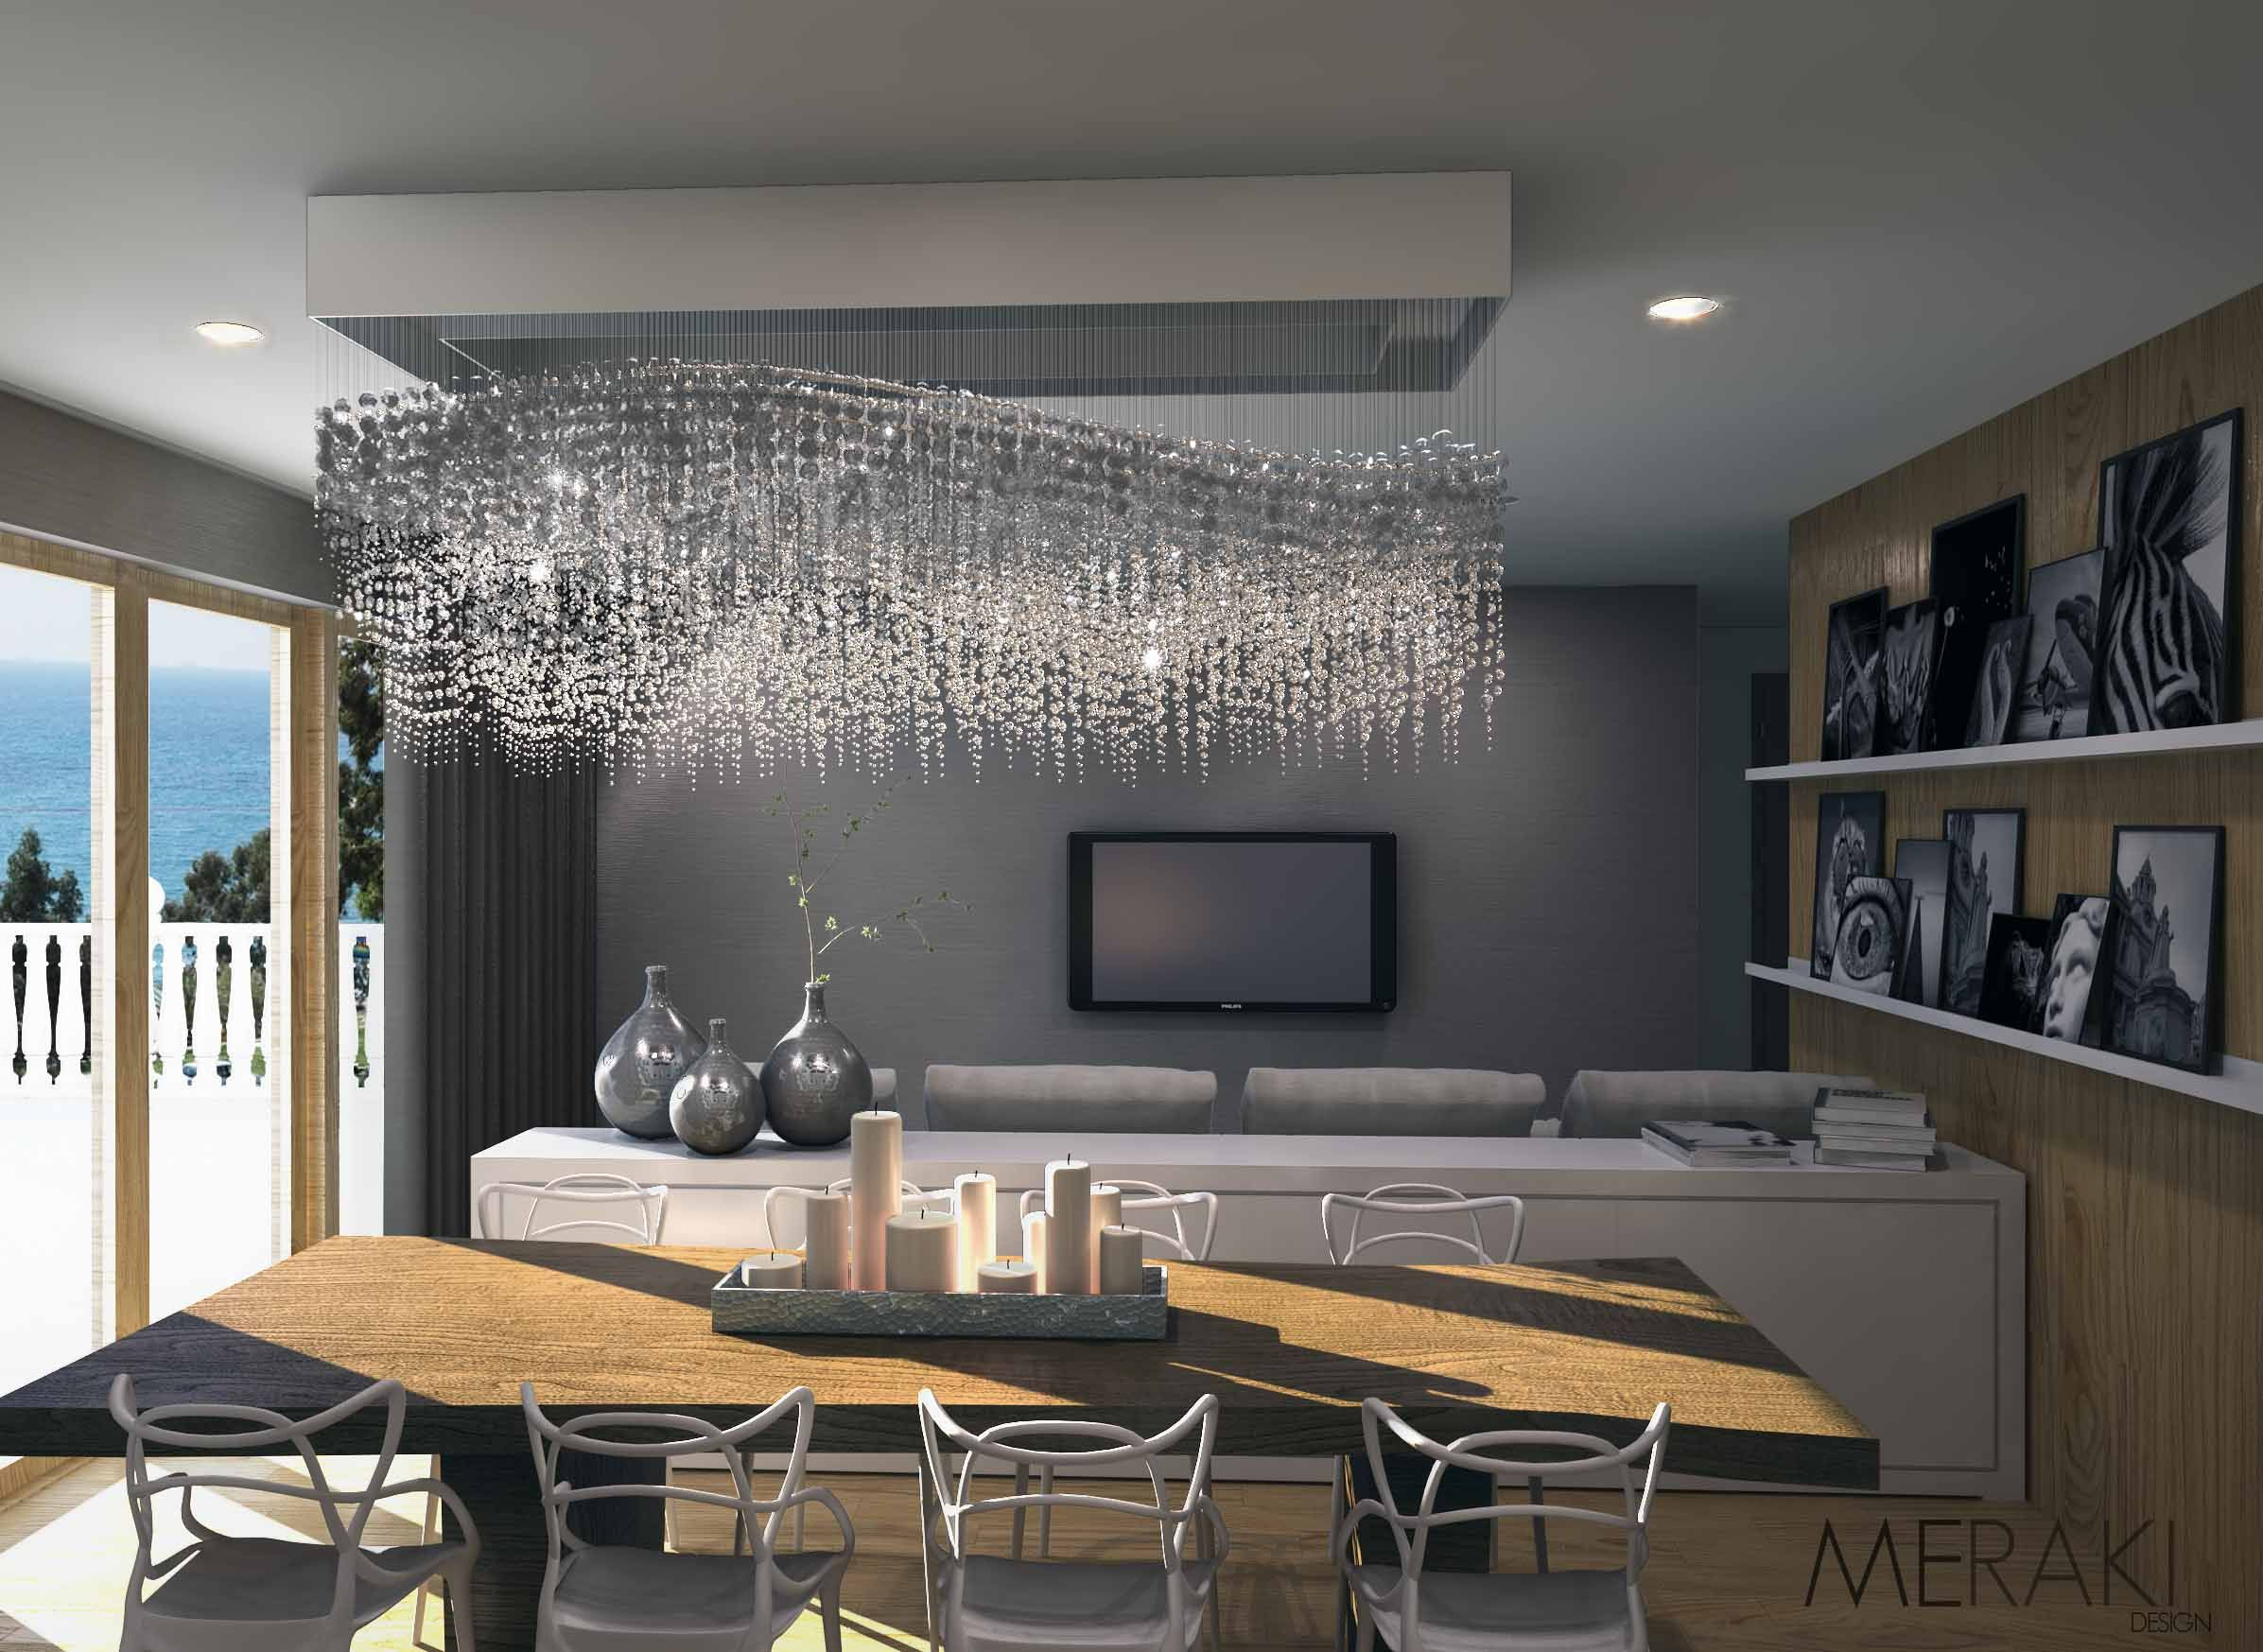 Stunning residential project by meraki design modern living rooms